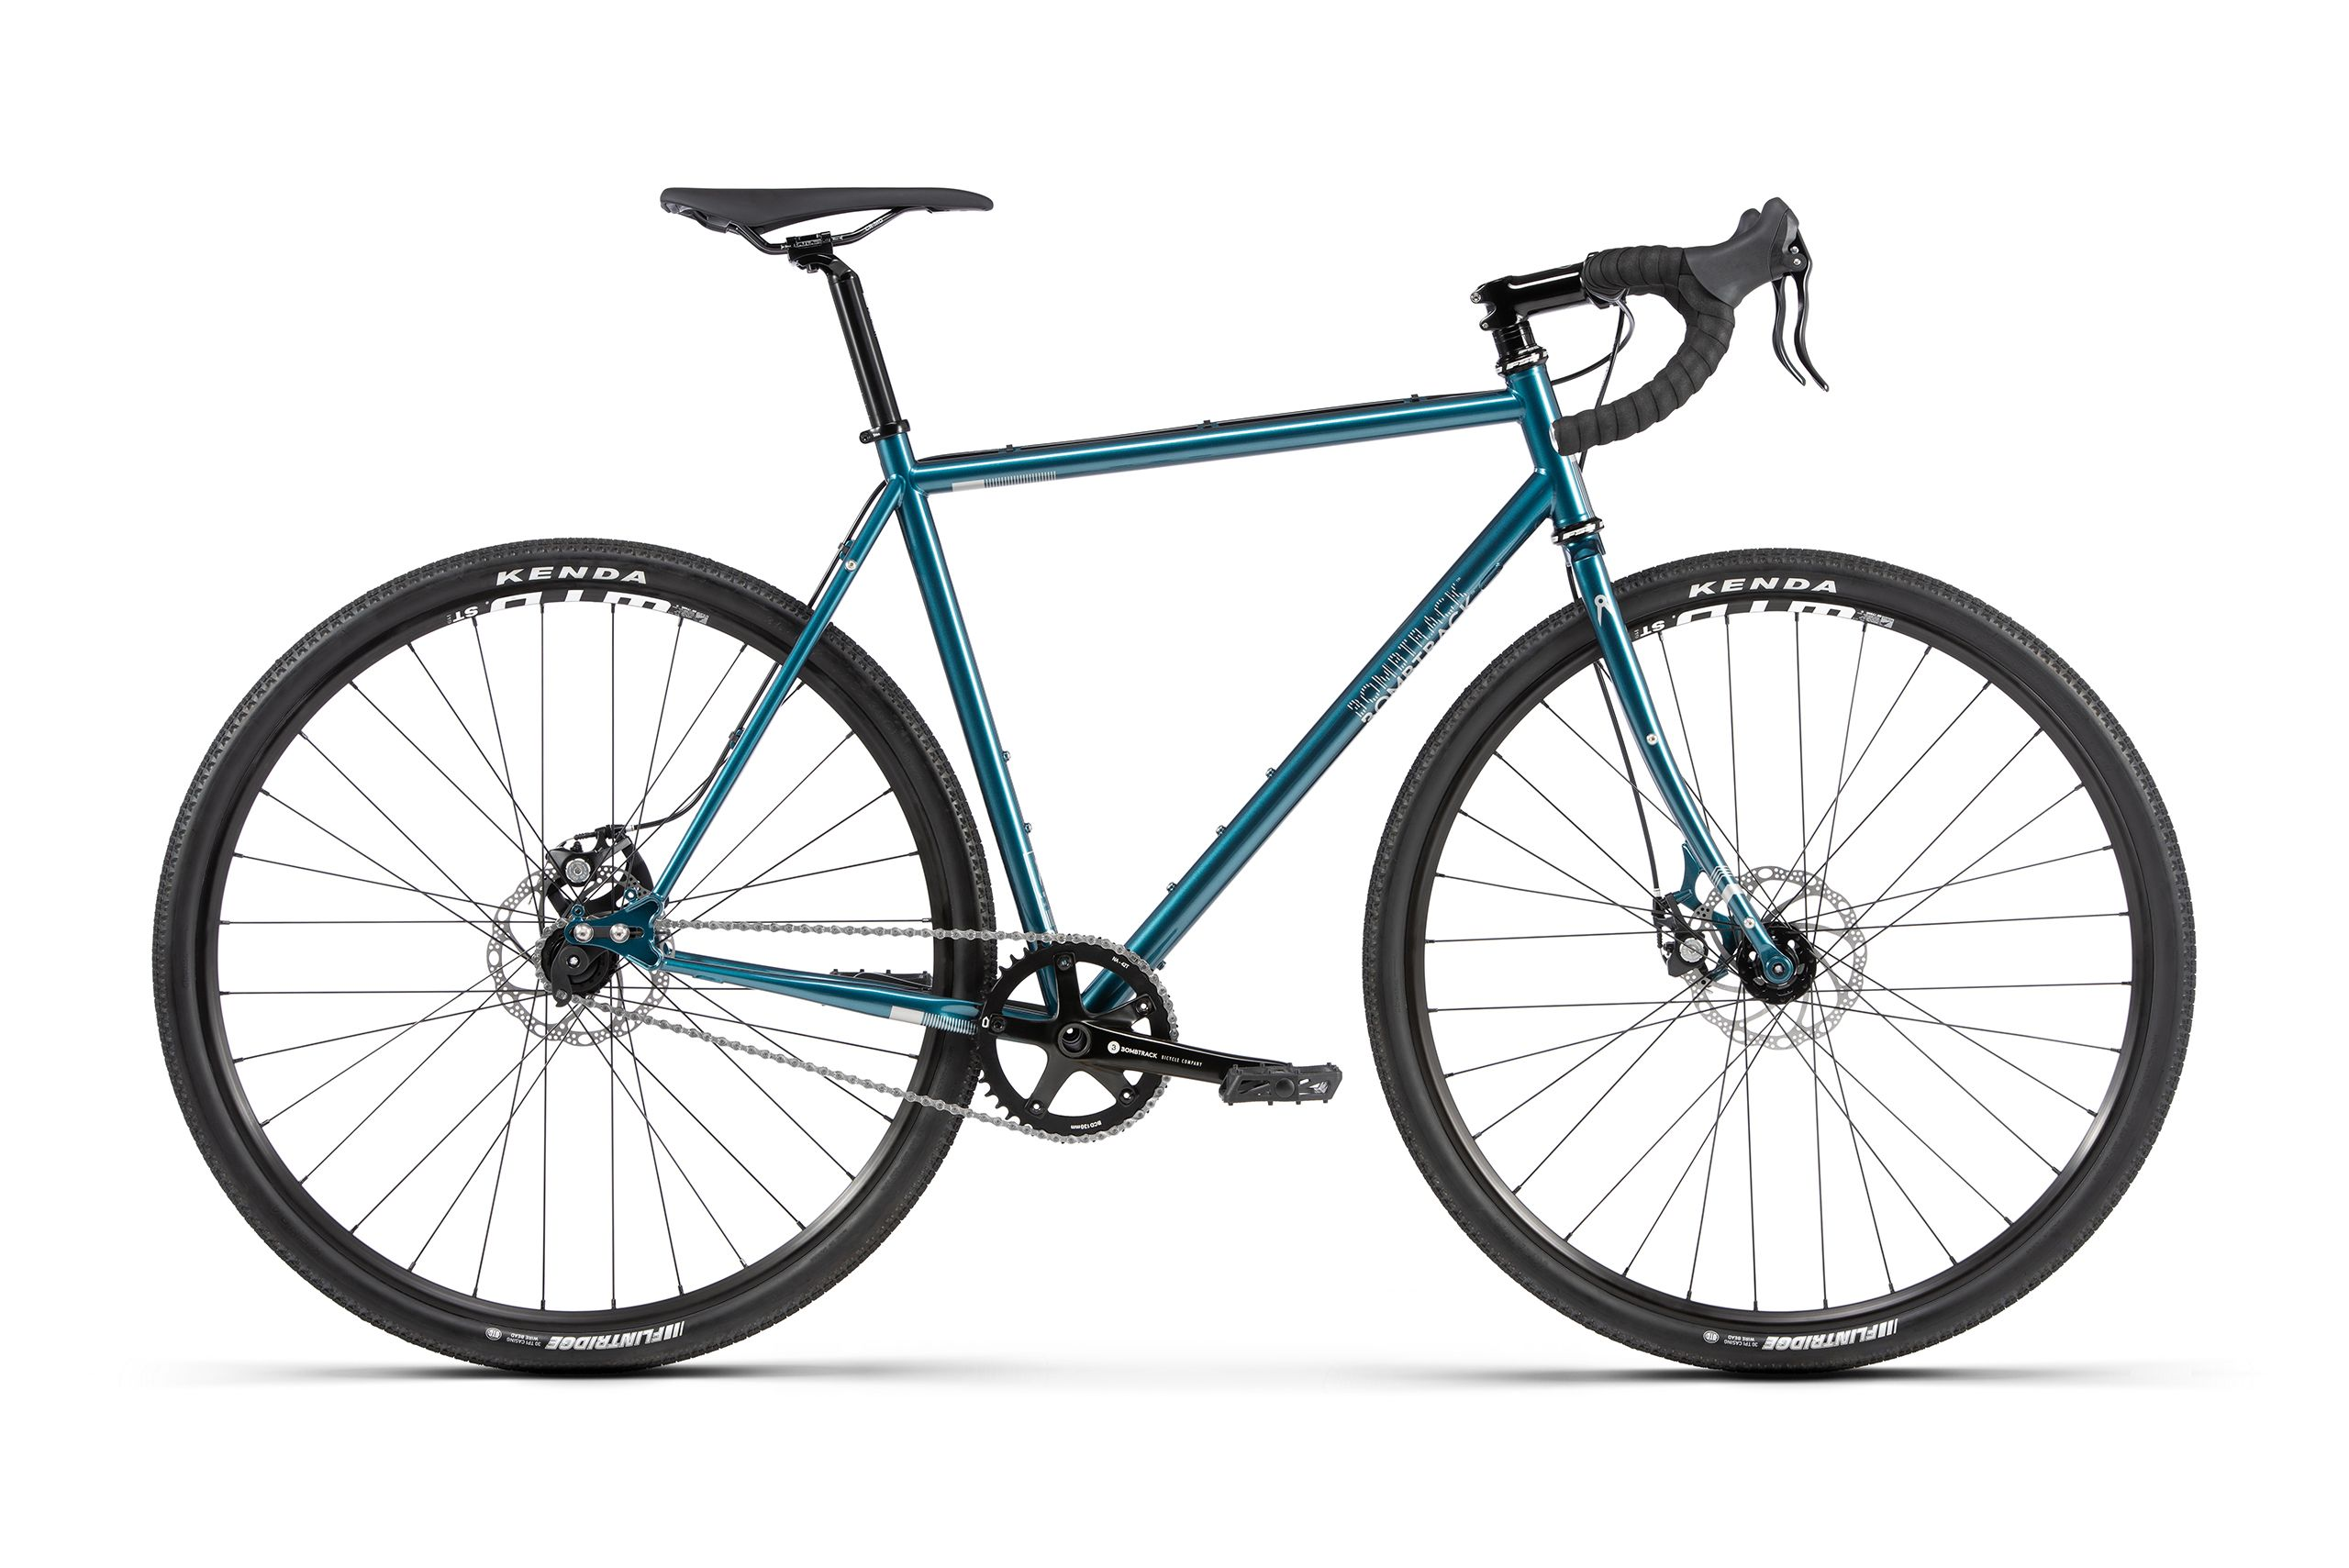 Bombtrack Arise 2 Teal Sports Hybrid Bike 2020 | City